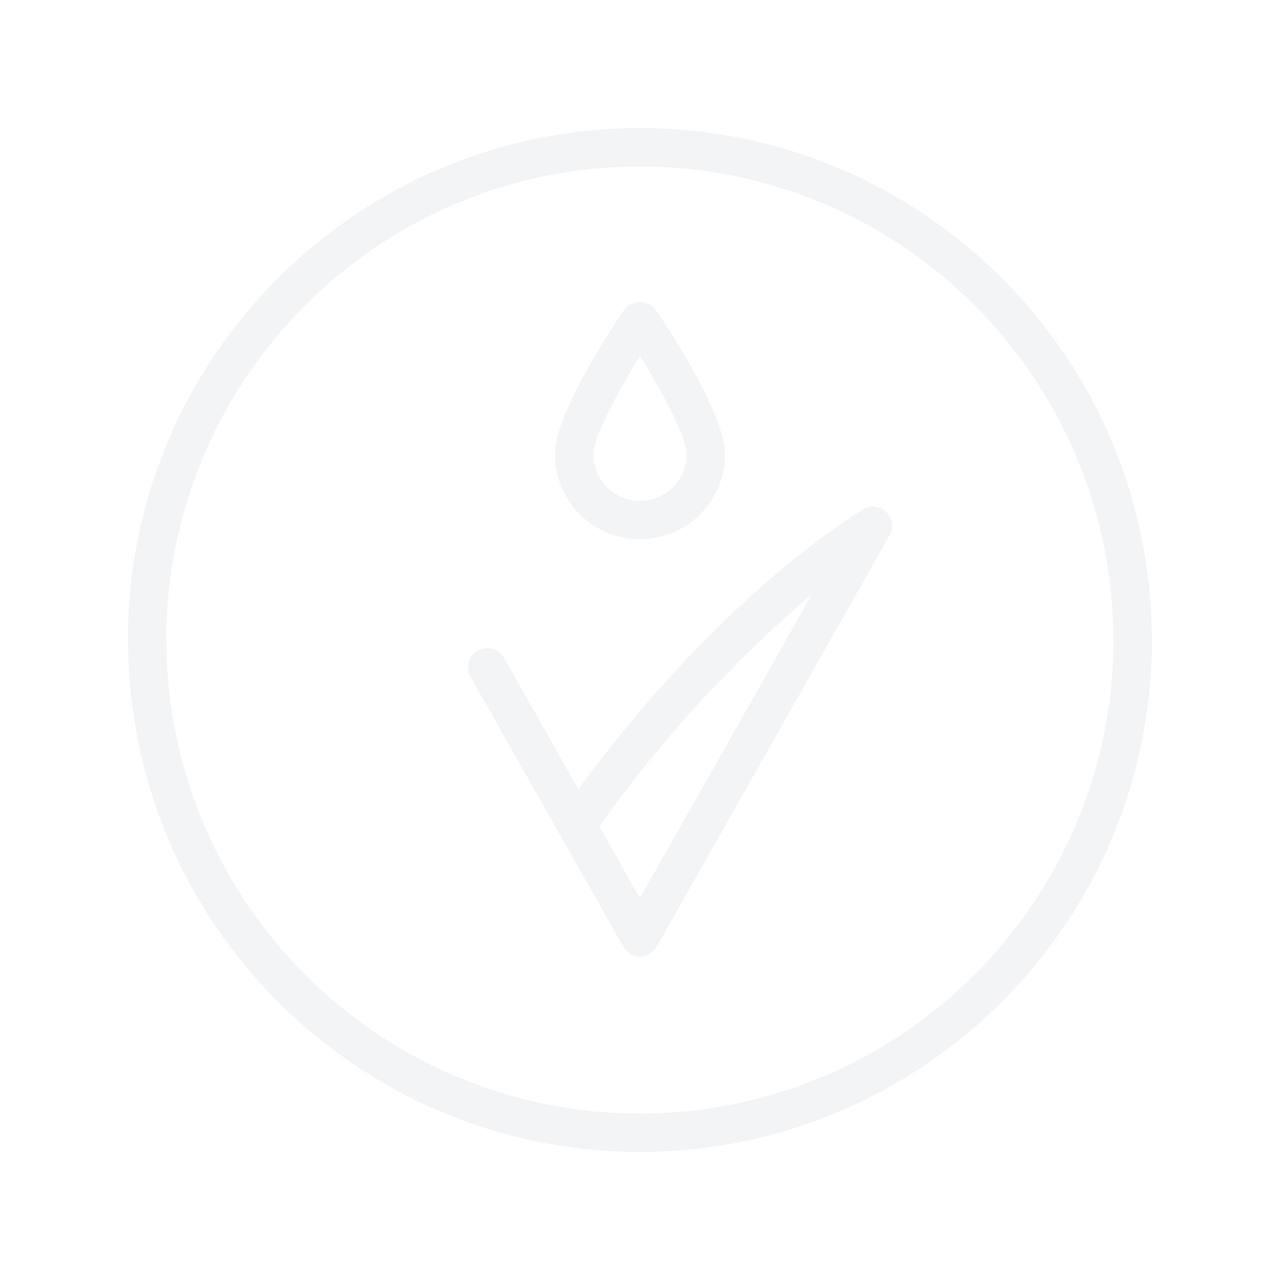 MAYBELLINE Snapscara Mascara 9.5ml